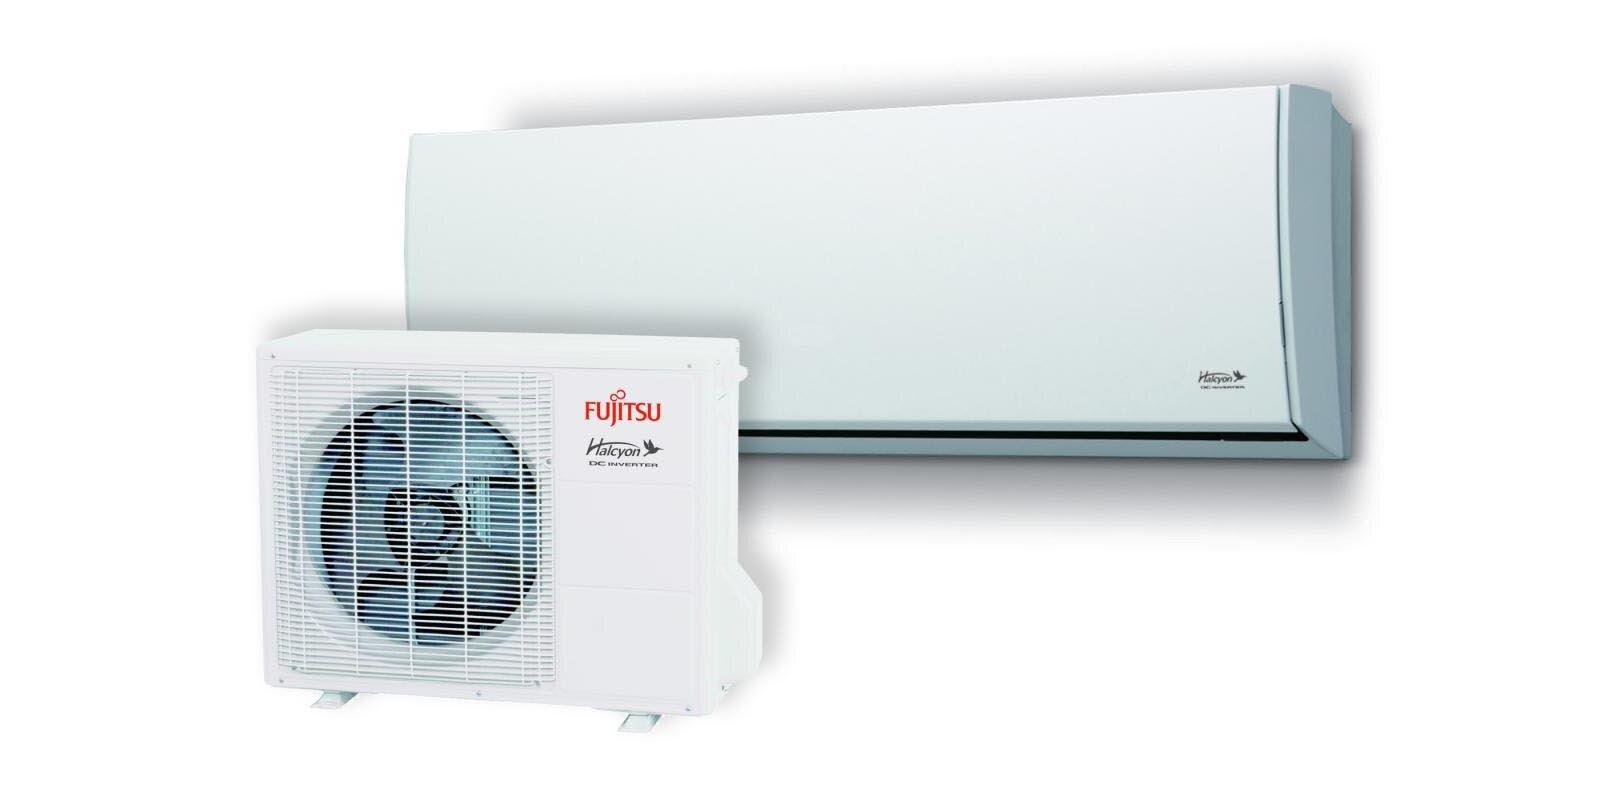 Fujitsu Heat Pump  & Mini Split Systems - Installation, Repair and Service.jpg